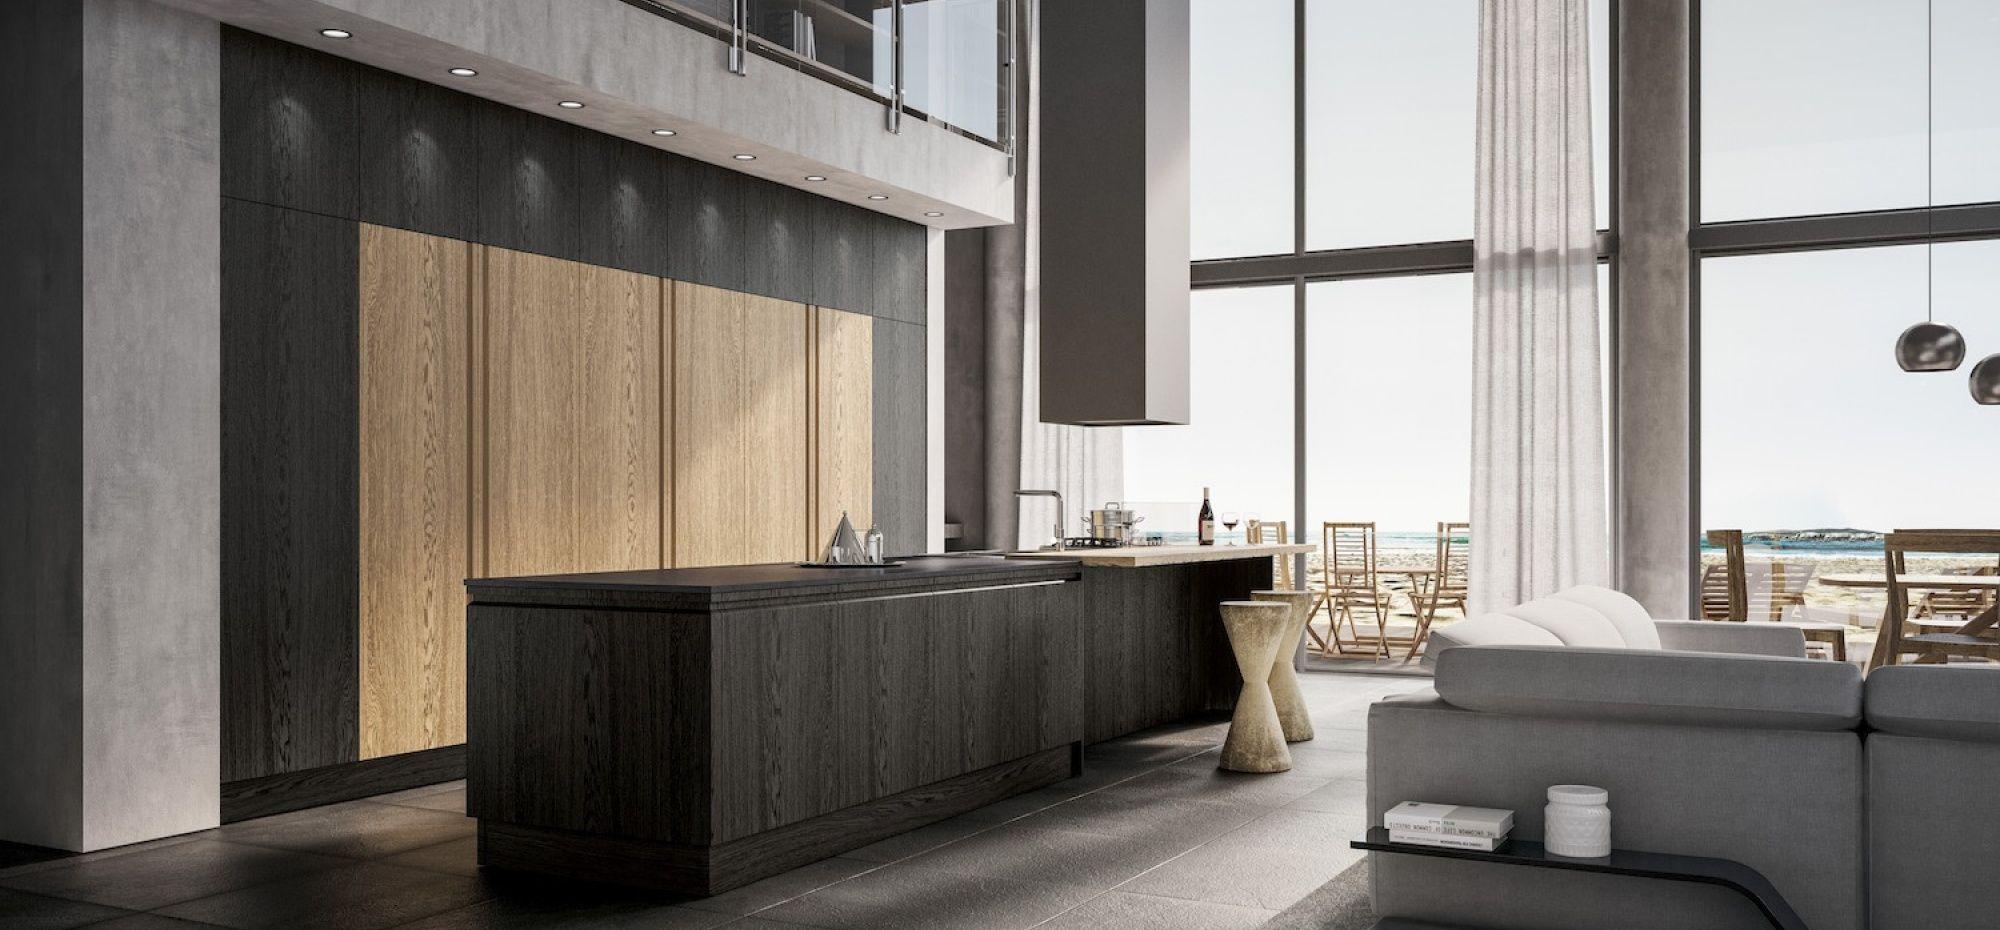 Canova • Cucine moderne by Berloni | kitchen | Modern ...